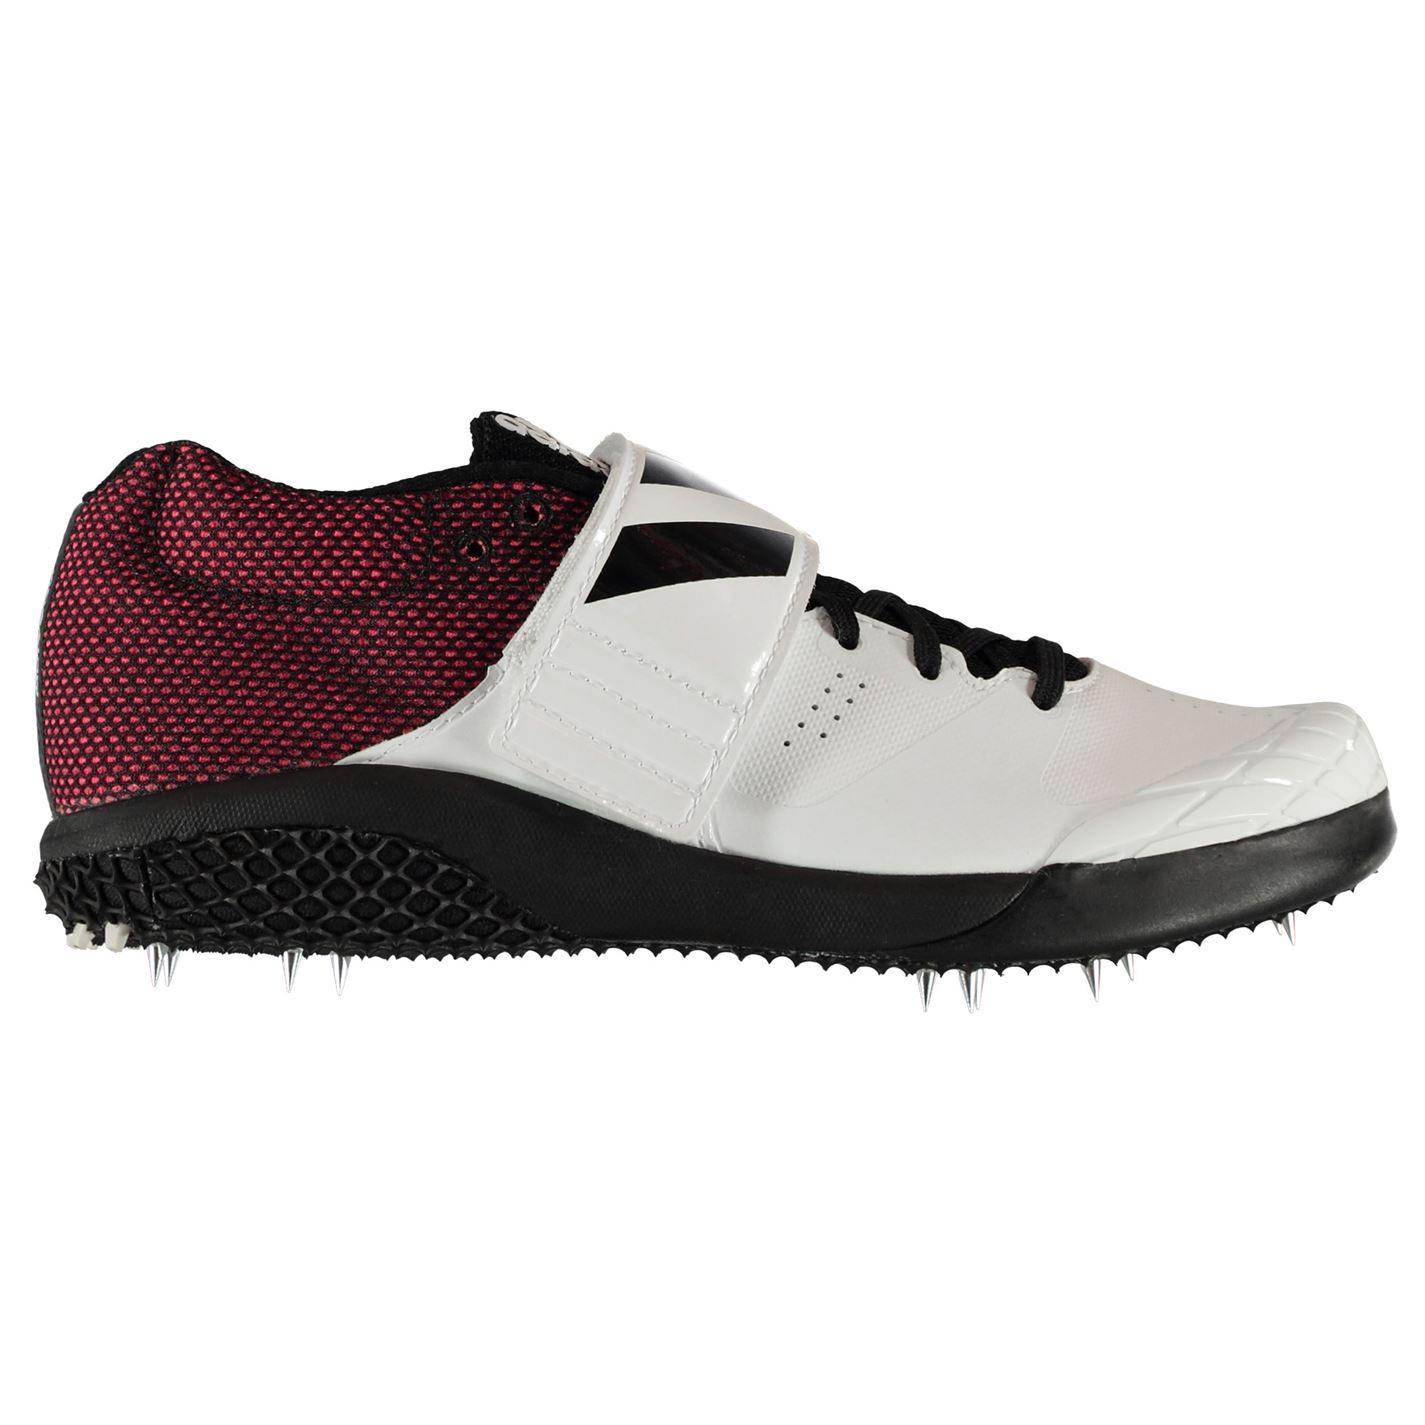 Adidas adizero Jav Sn94